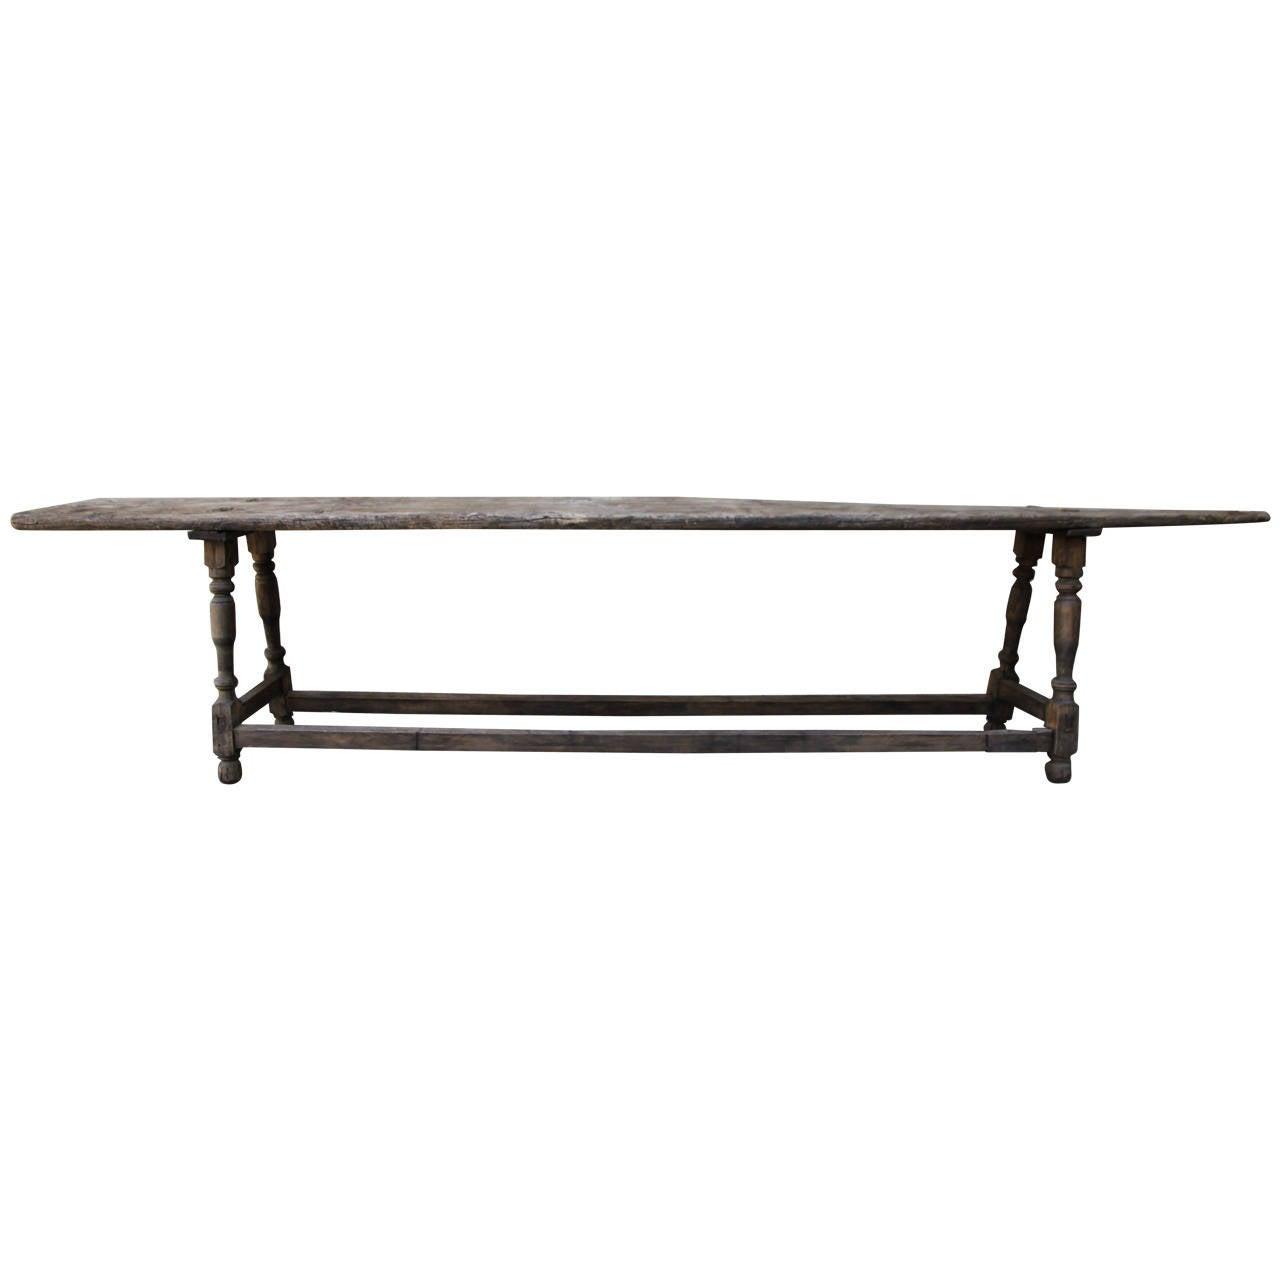 Antique Primitive Work Table At 1stdibs